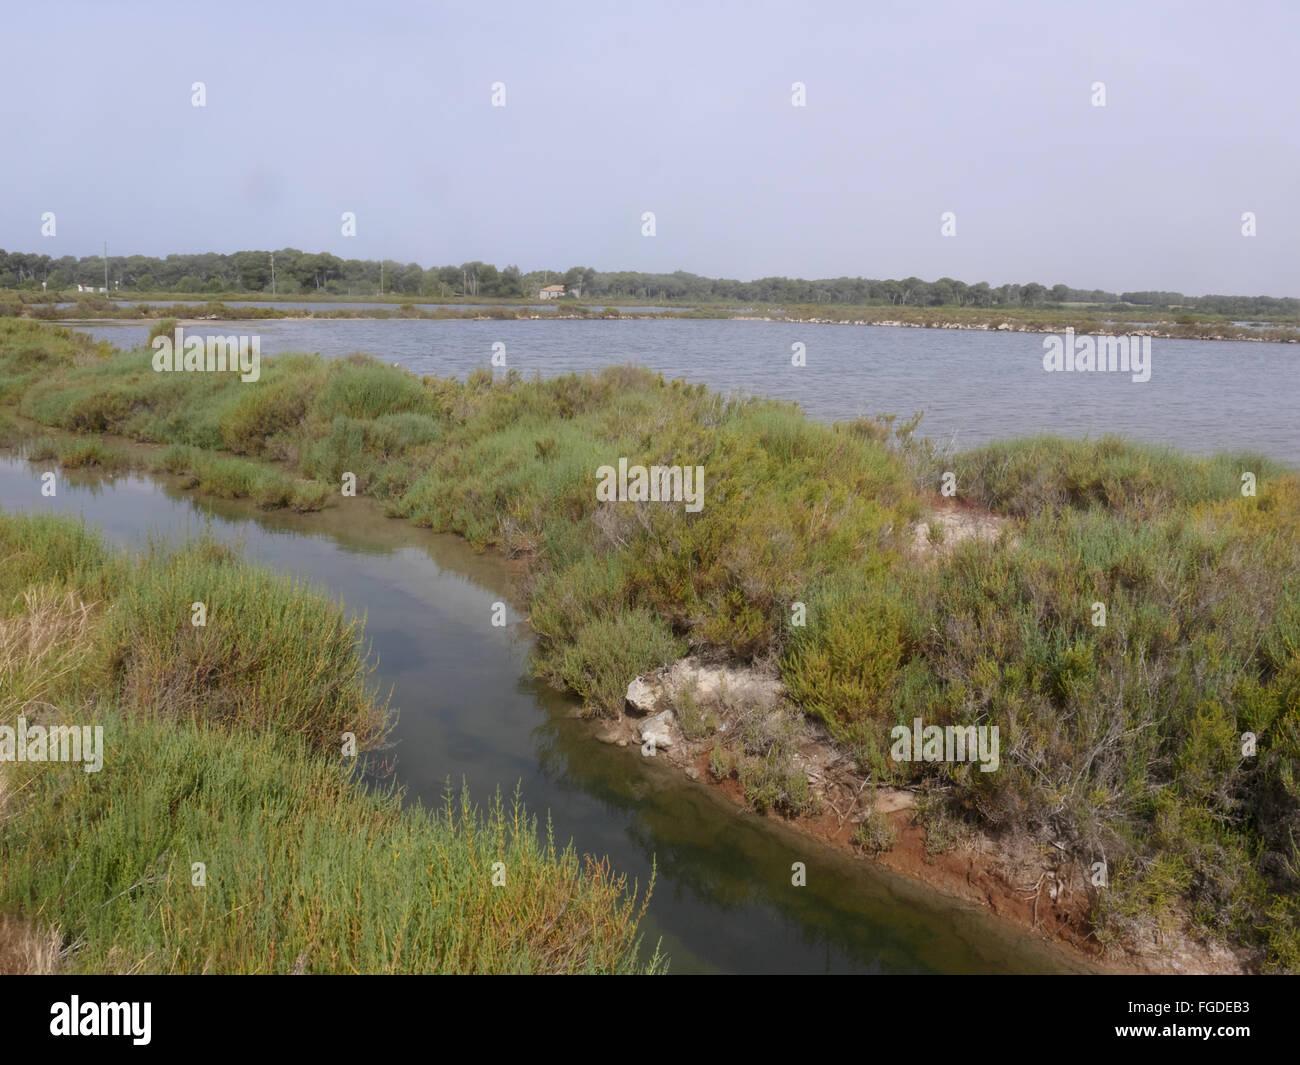 Voir des zones côtières Salines, Es Salobrar de Campos, Majorque, Îles Baléares, Espagne, Juin Photo Stock